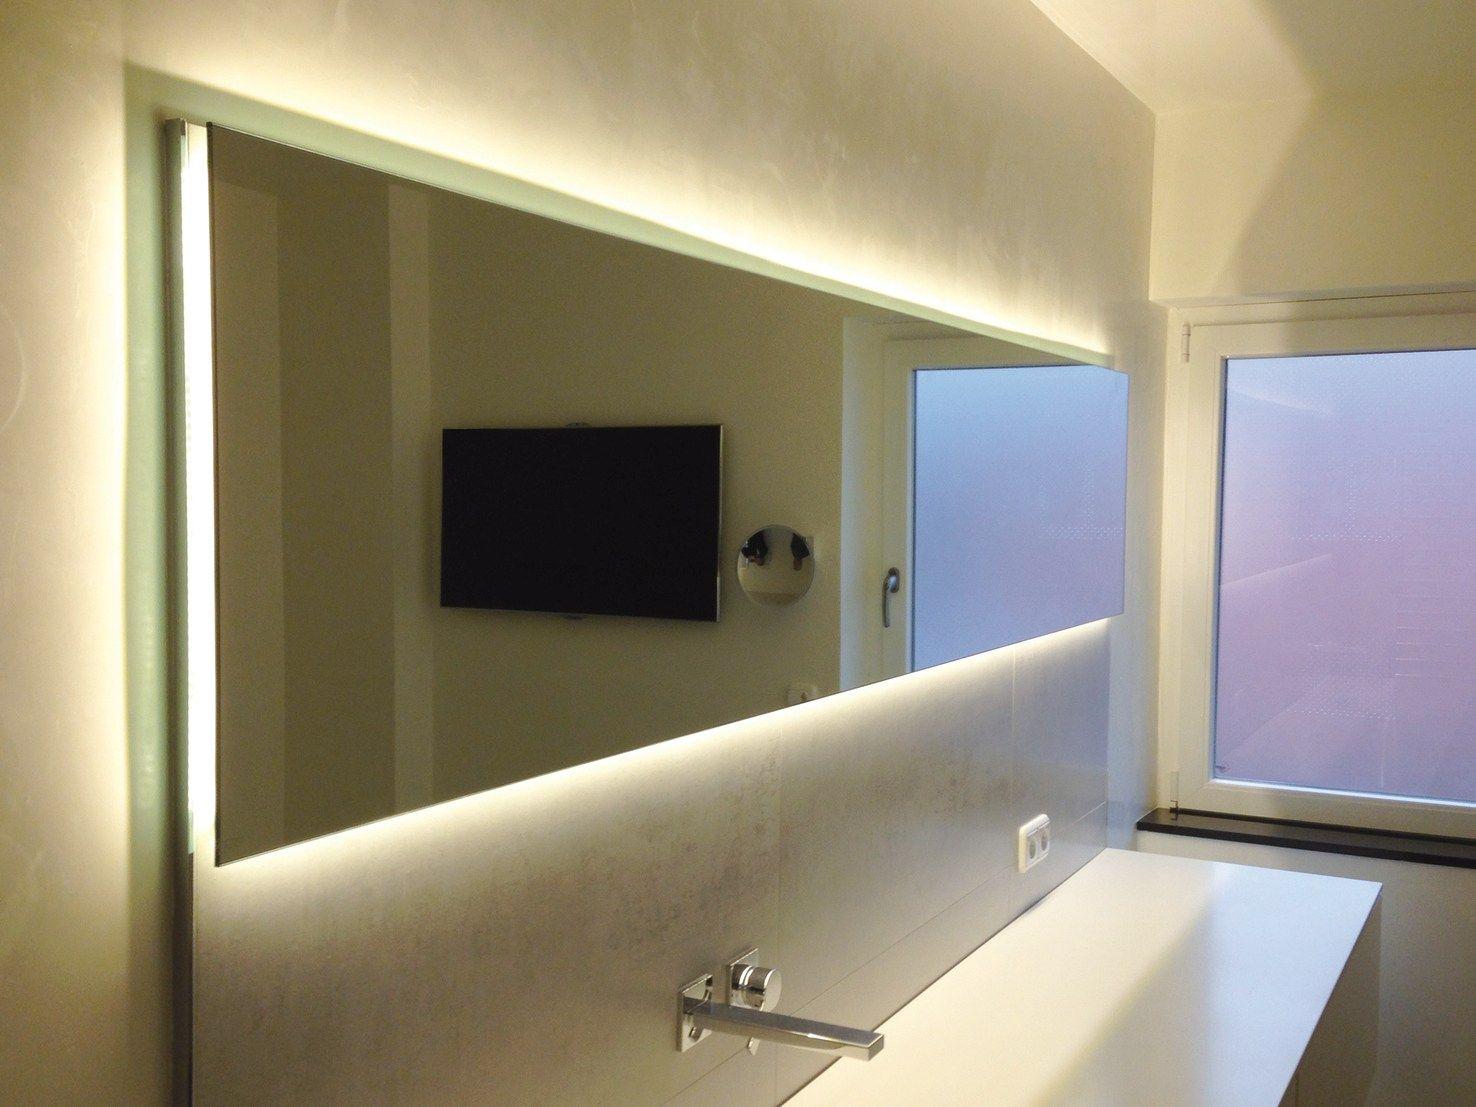 Lampade sospensione design - Lampade bagno led ...